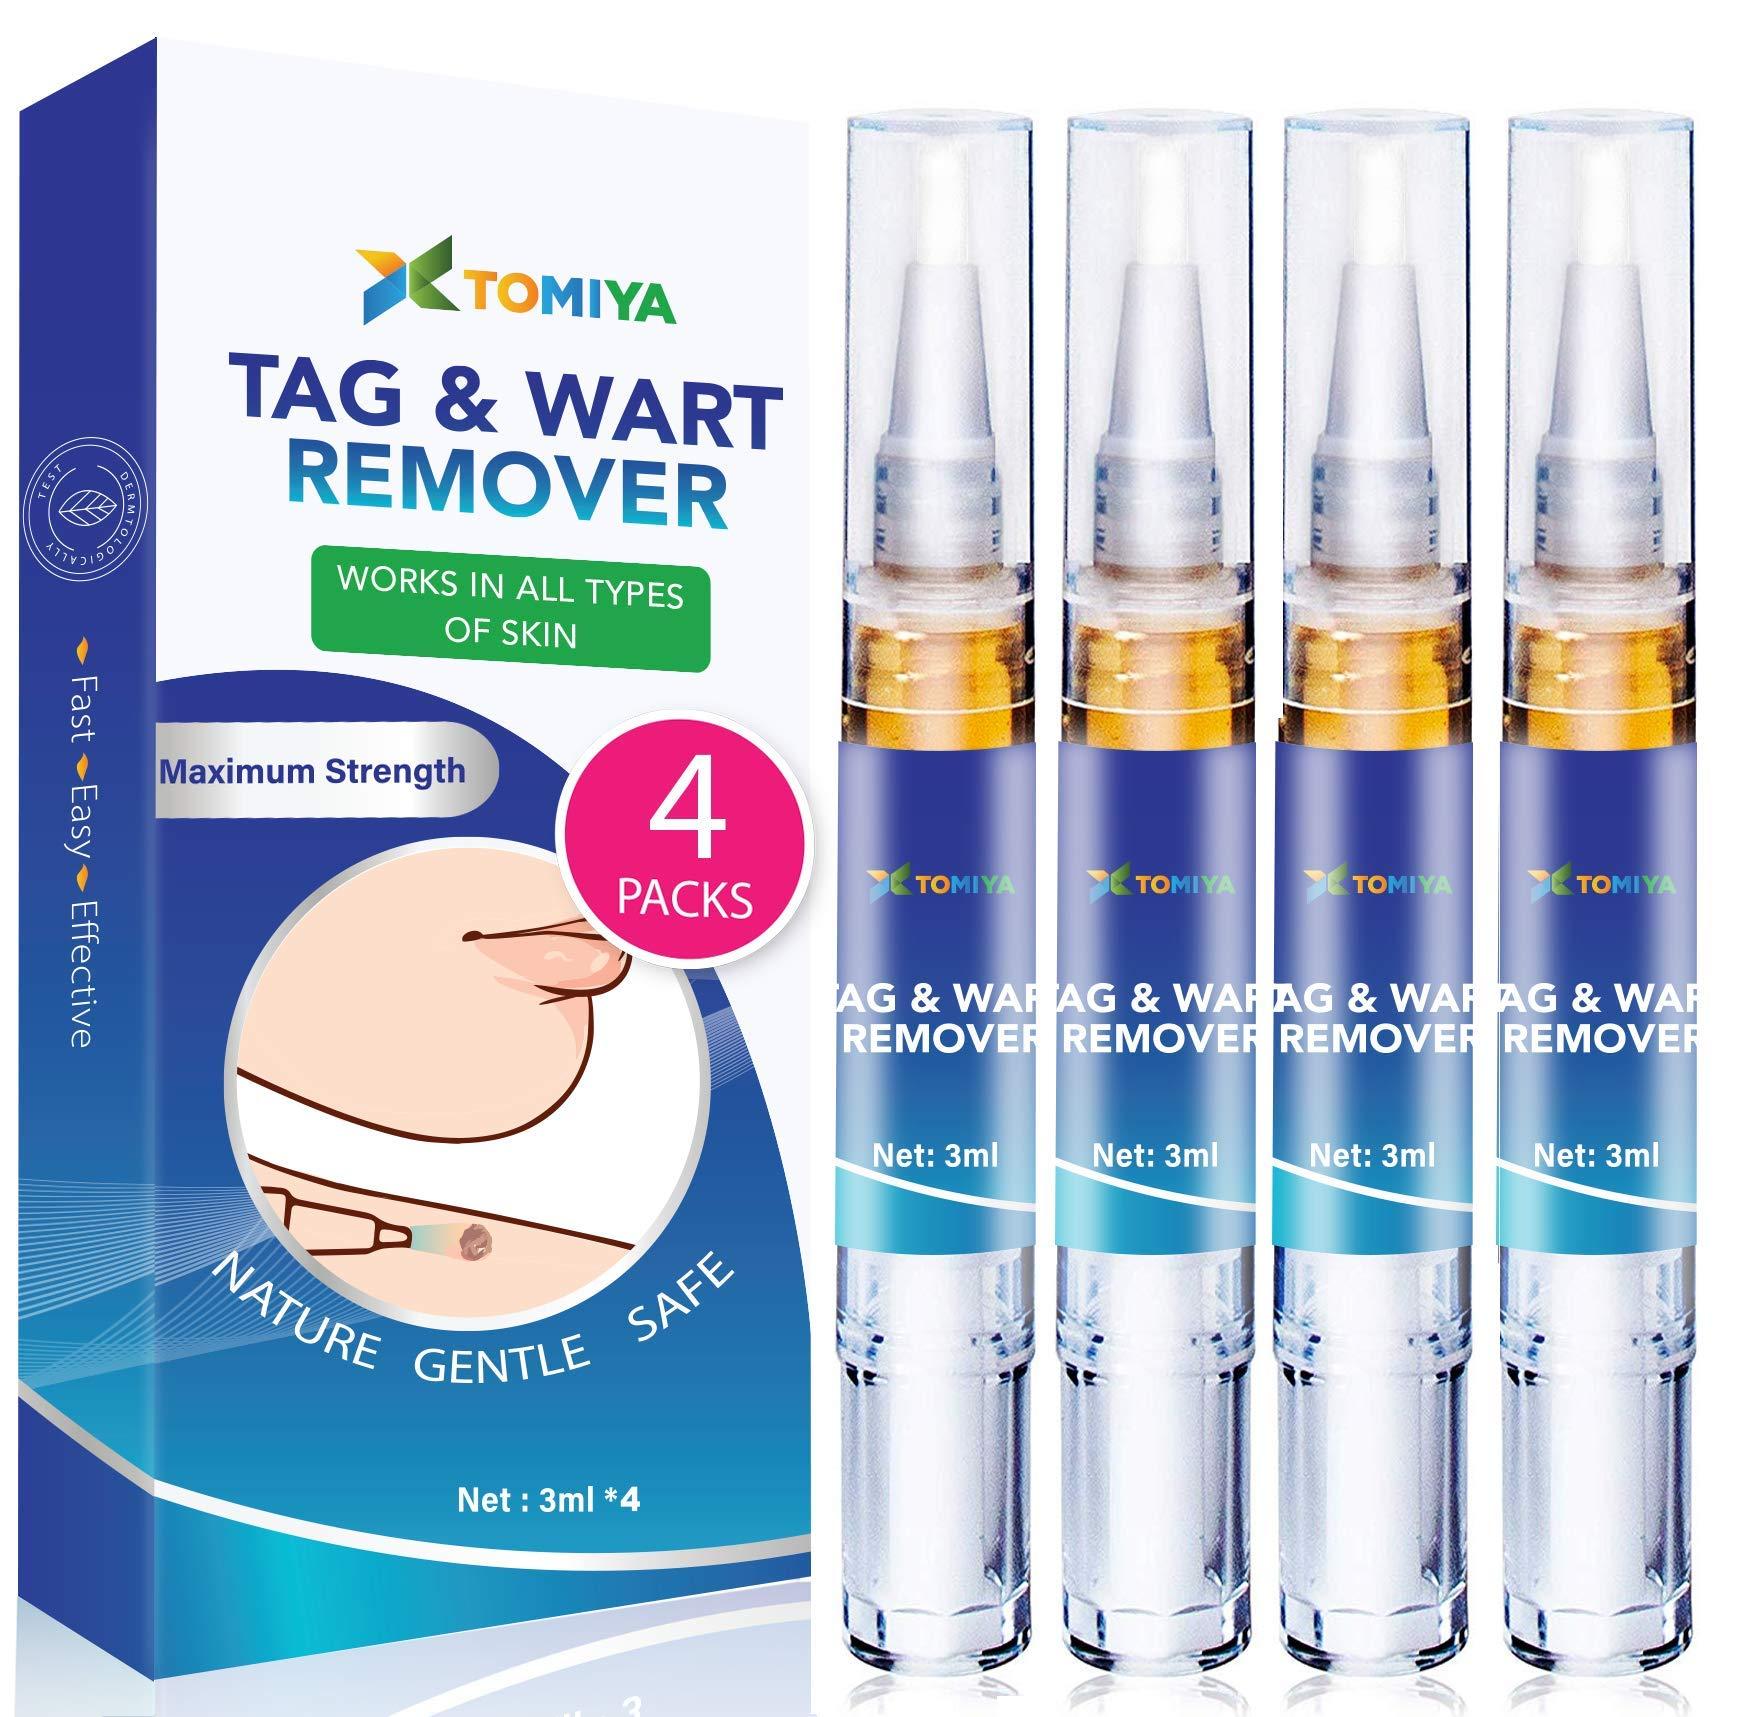 Tomiya Skin Tag Remover - Wart Remover - Quickly Remove Common And Plantar Warts - Corns - Callus -Skin Tag Removal(4 Packs) (Blue)